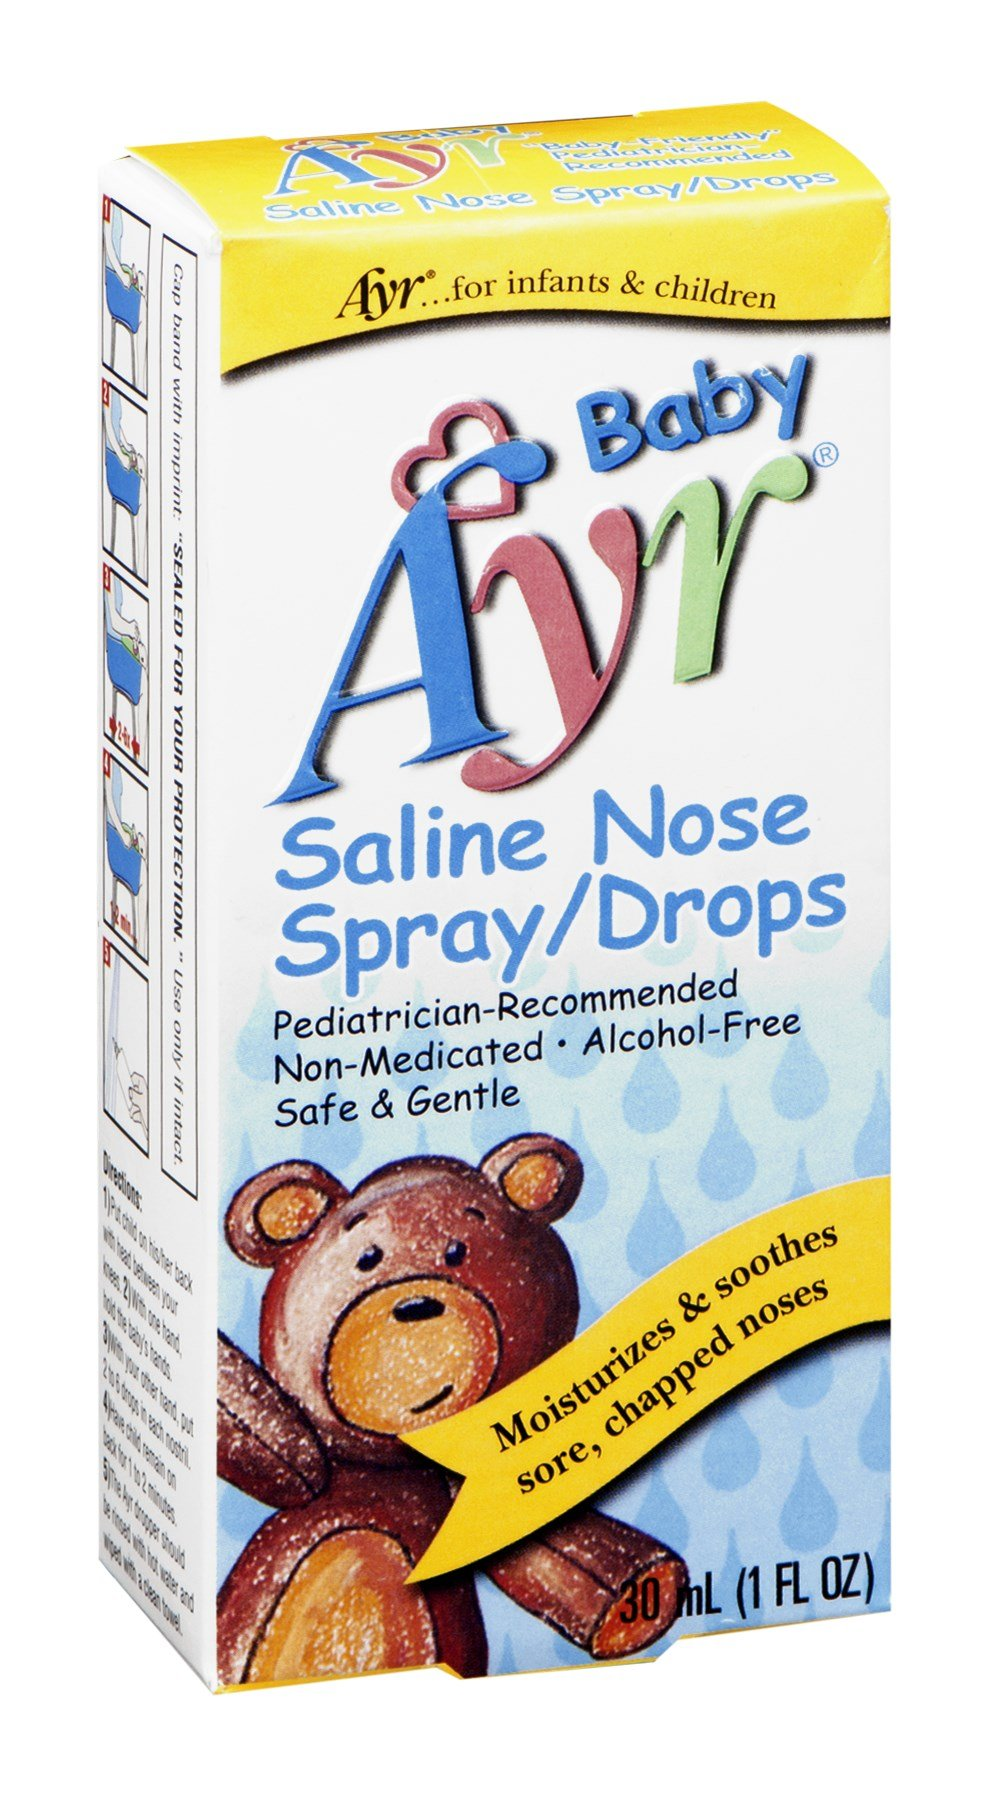 Ayr Baby Saline Nose Spray